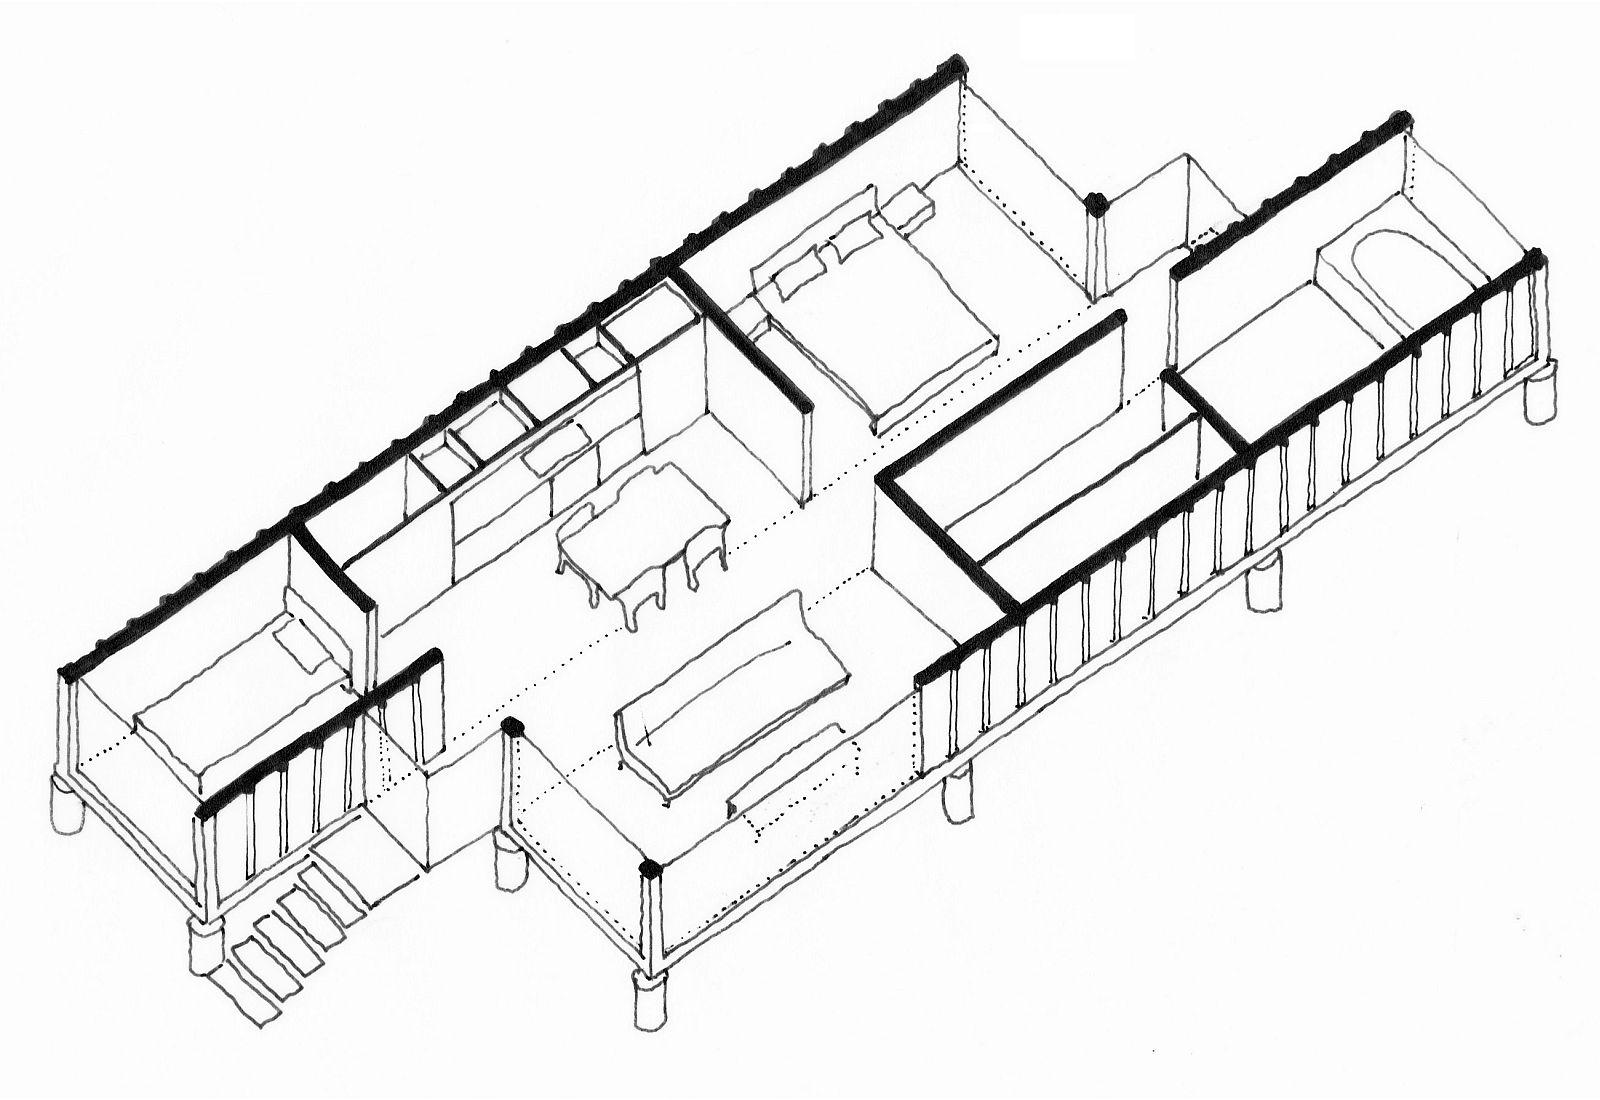 Benjamin Garcia Saxe Containers Of Hope Isometric Via Smallhousebliss W 960 H 787babd19bea26fb8be0839db6a63b1e Cob House Plans